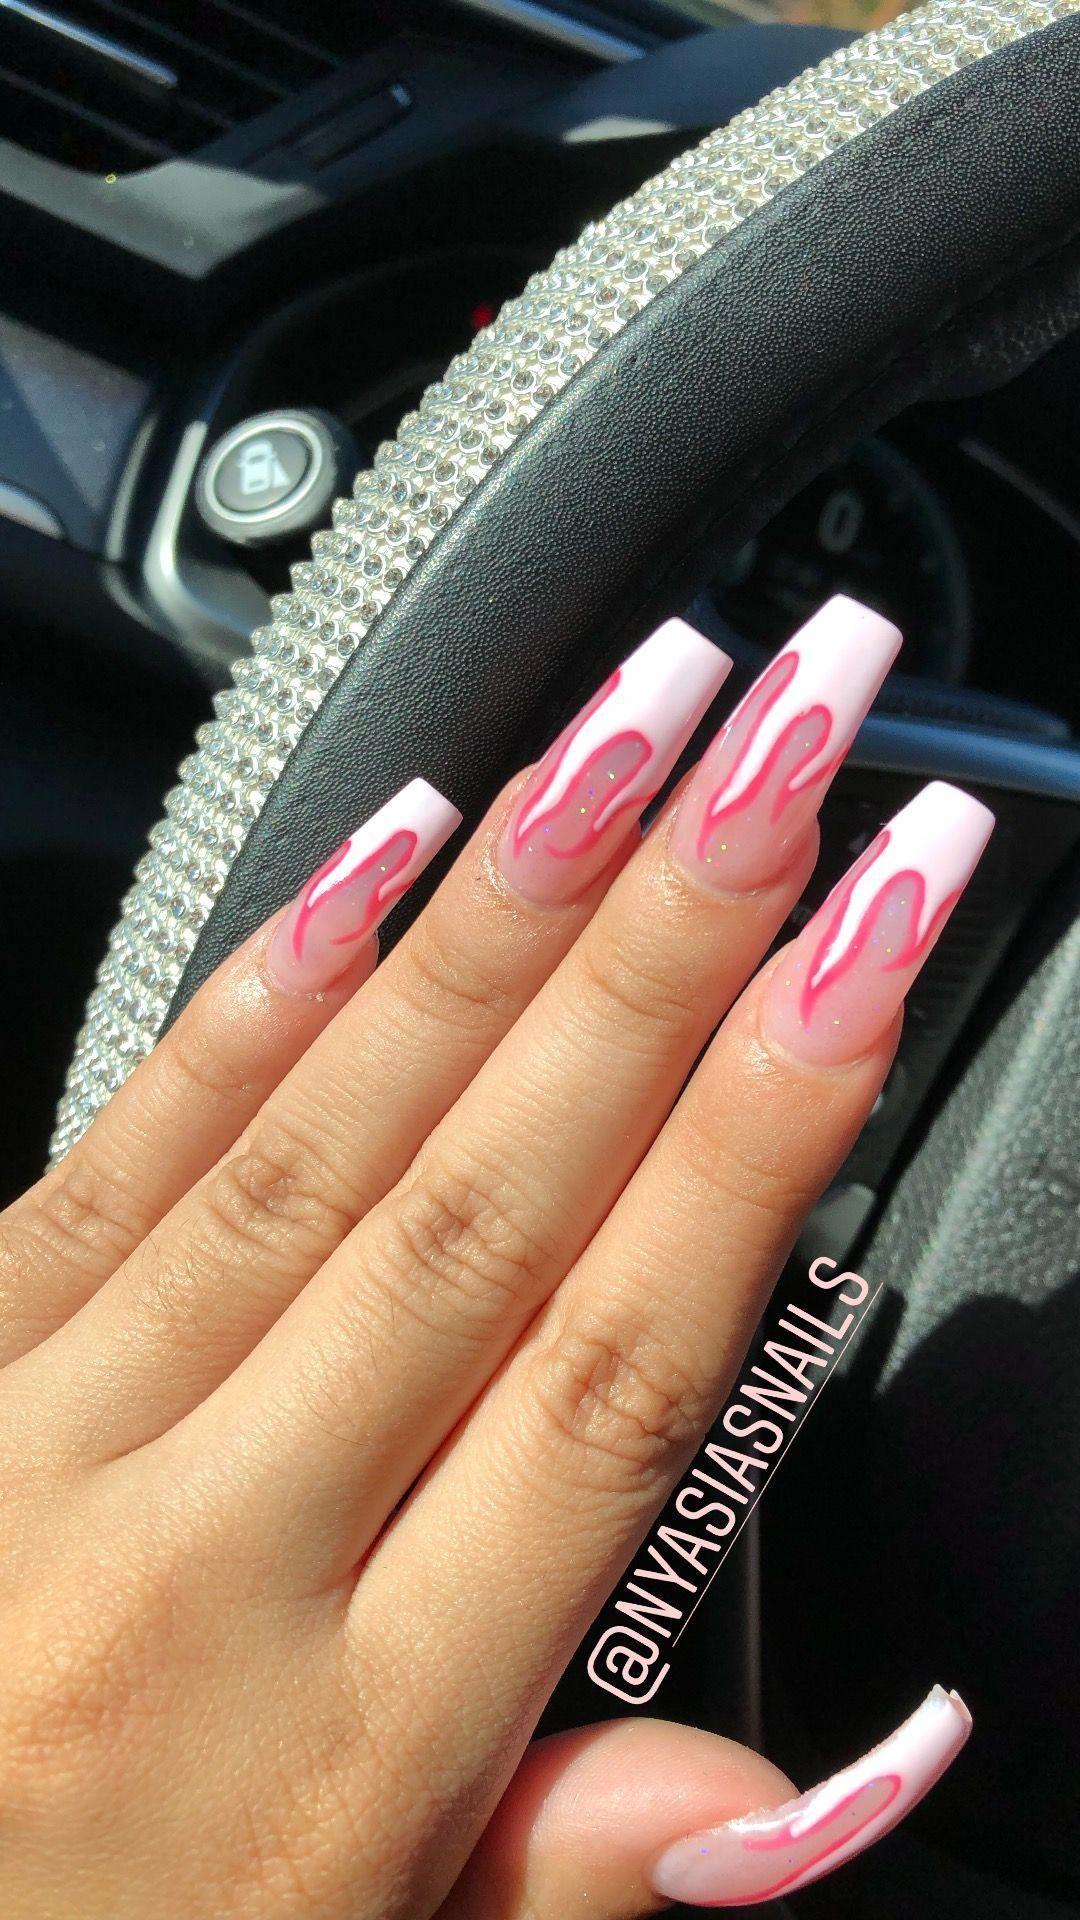 Nails Pink Flame Nails Long Acrylic Coffin Shape Nailscoffin Nailsshape In 2020 Coffin Shape Nails Acrylic Nail Shapes Pink Acrylic Nails